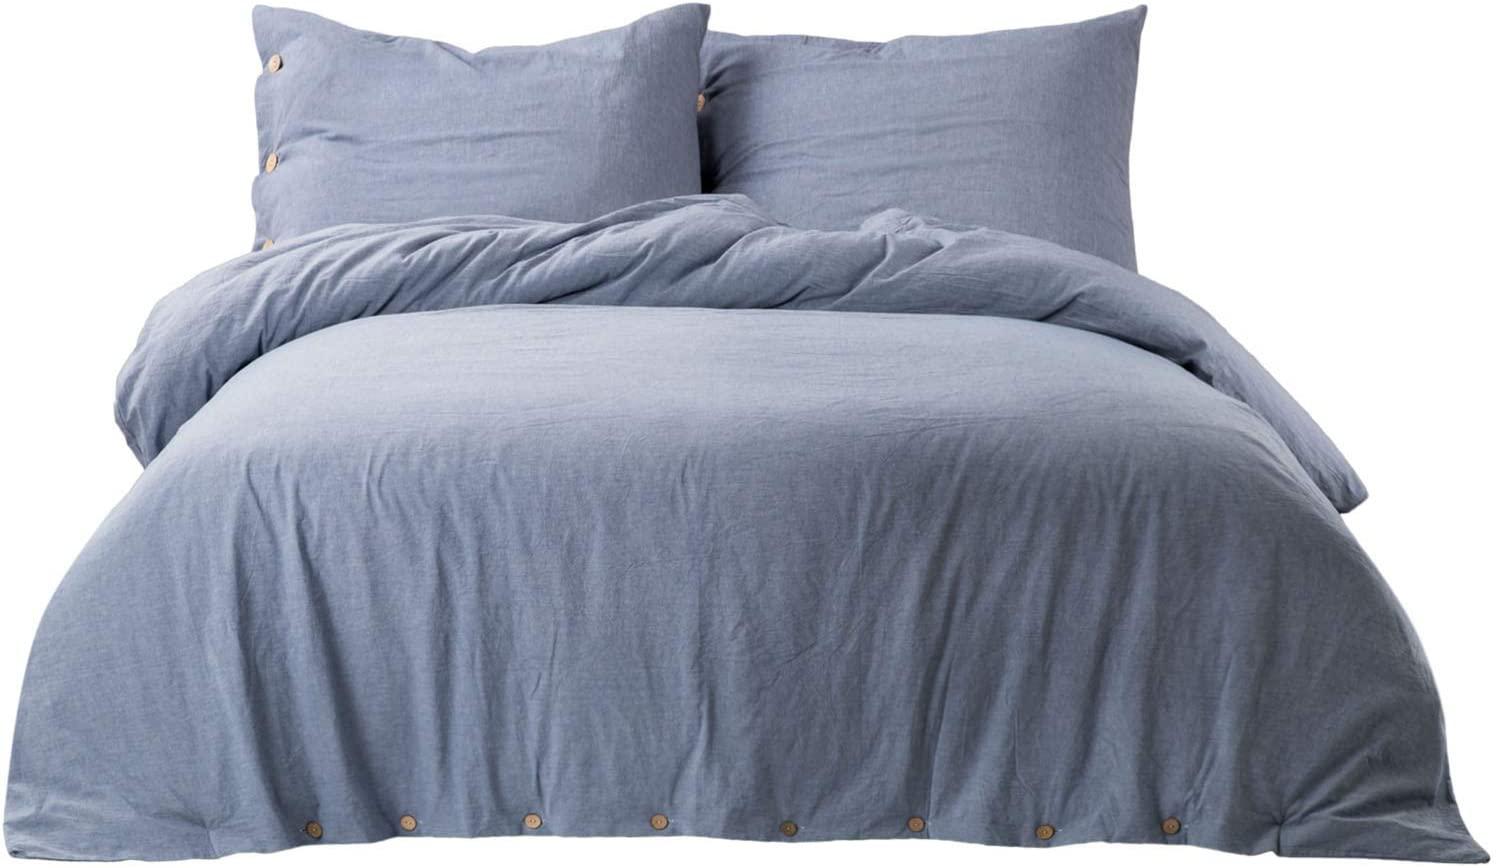 golden home 100 washed cotton duvet cover sets king size denim blue bedding set 3 pieces 1 duvet cover 2 pillow shams walmart com